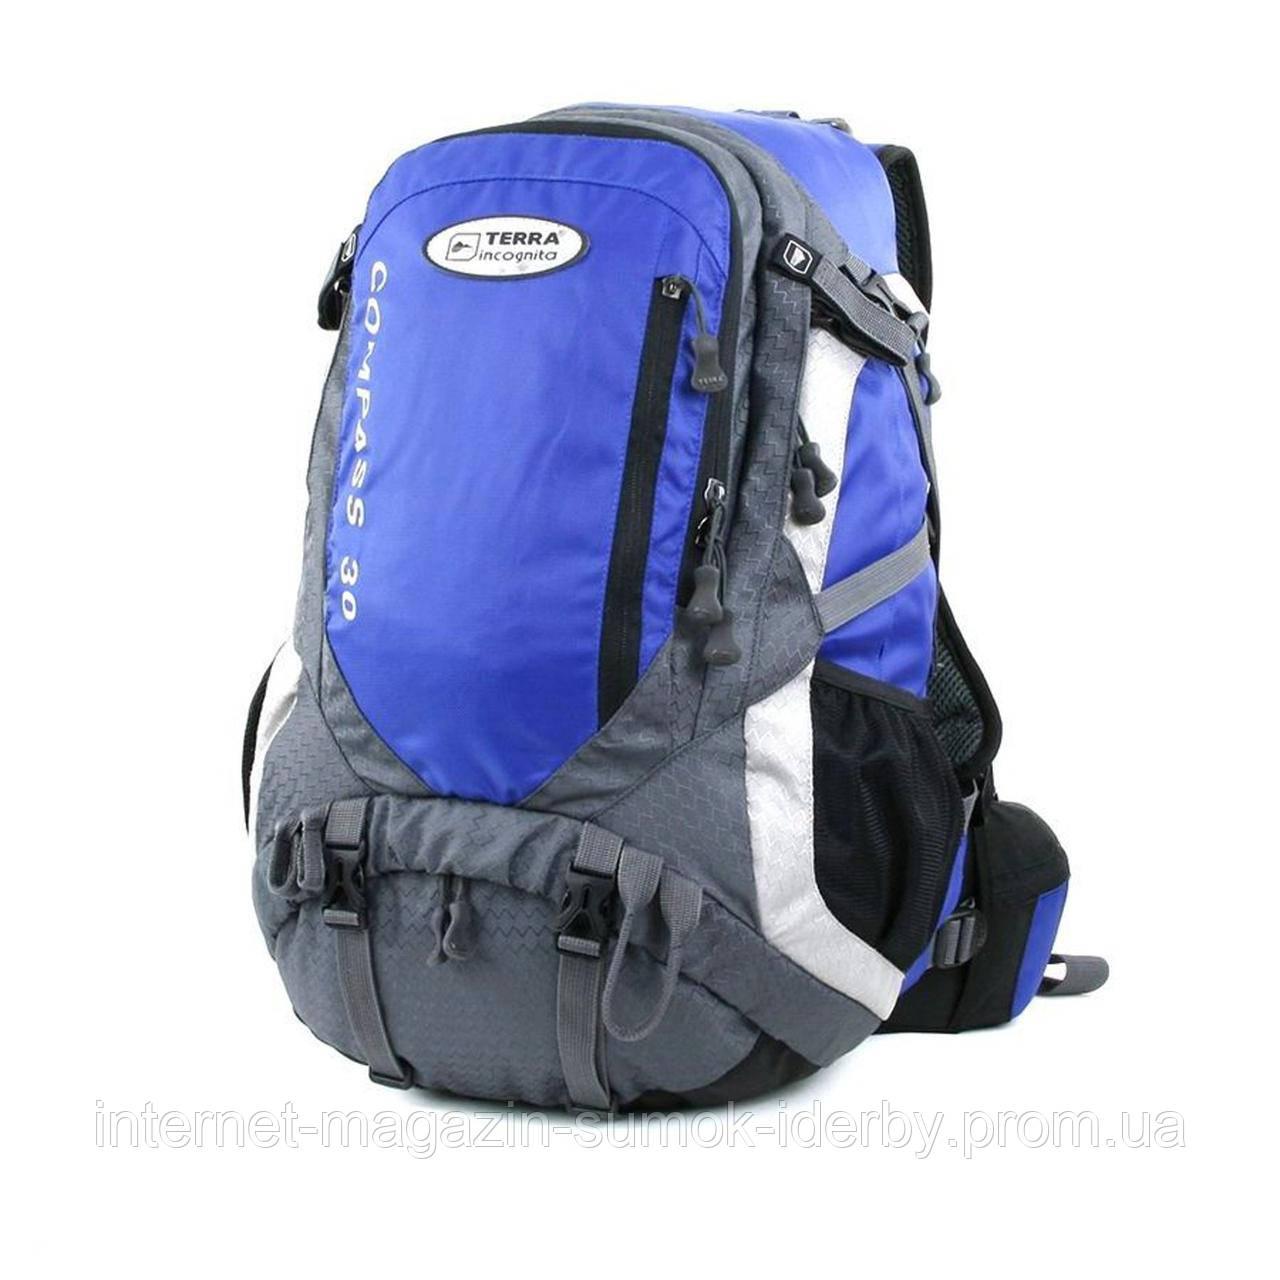 Рюкзак туристический terra incognita медведково сумка рюкзак